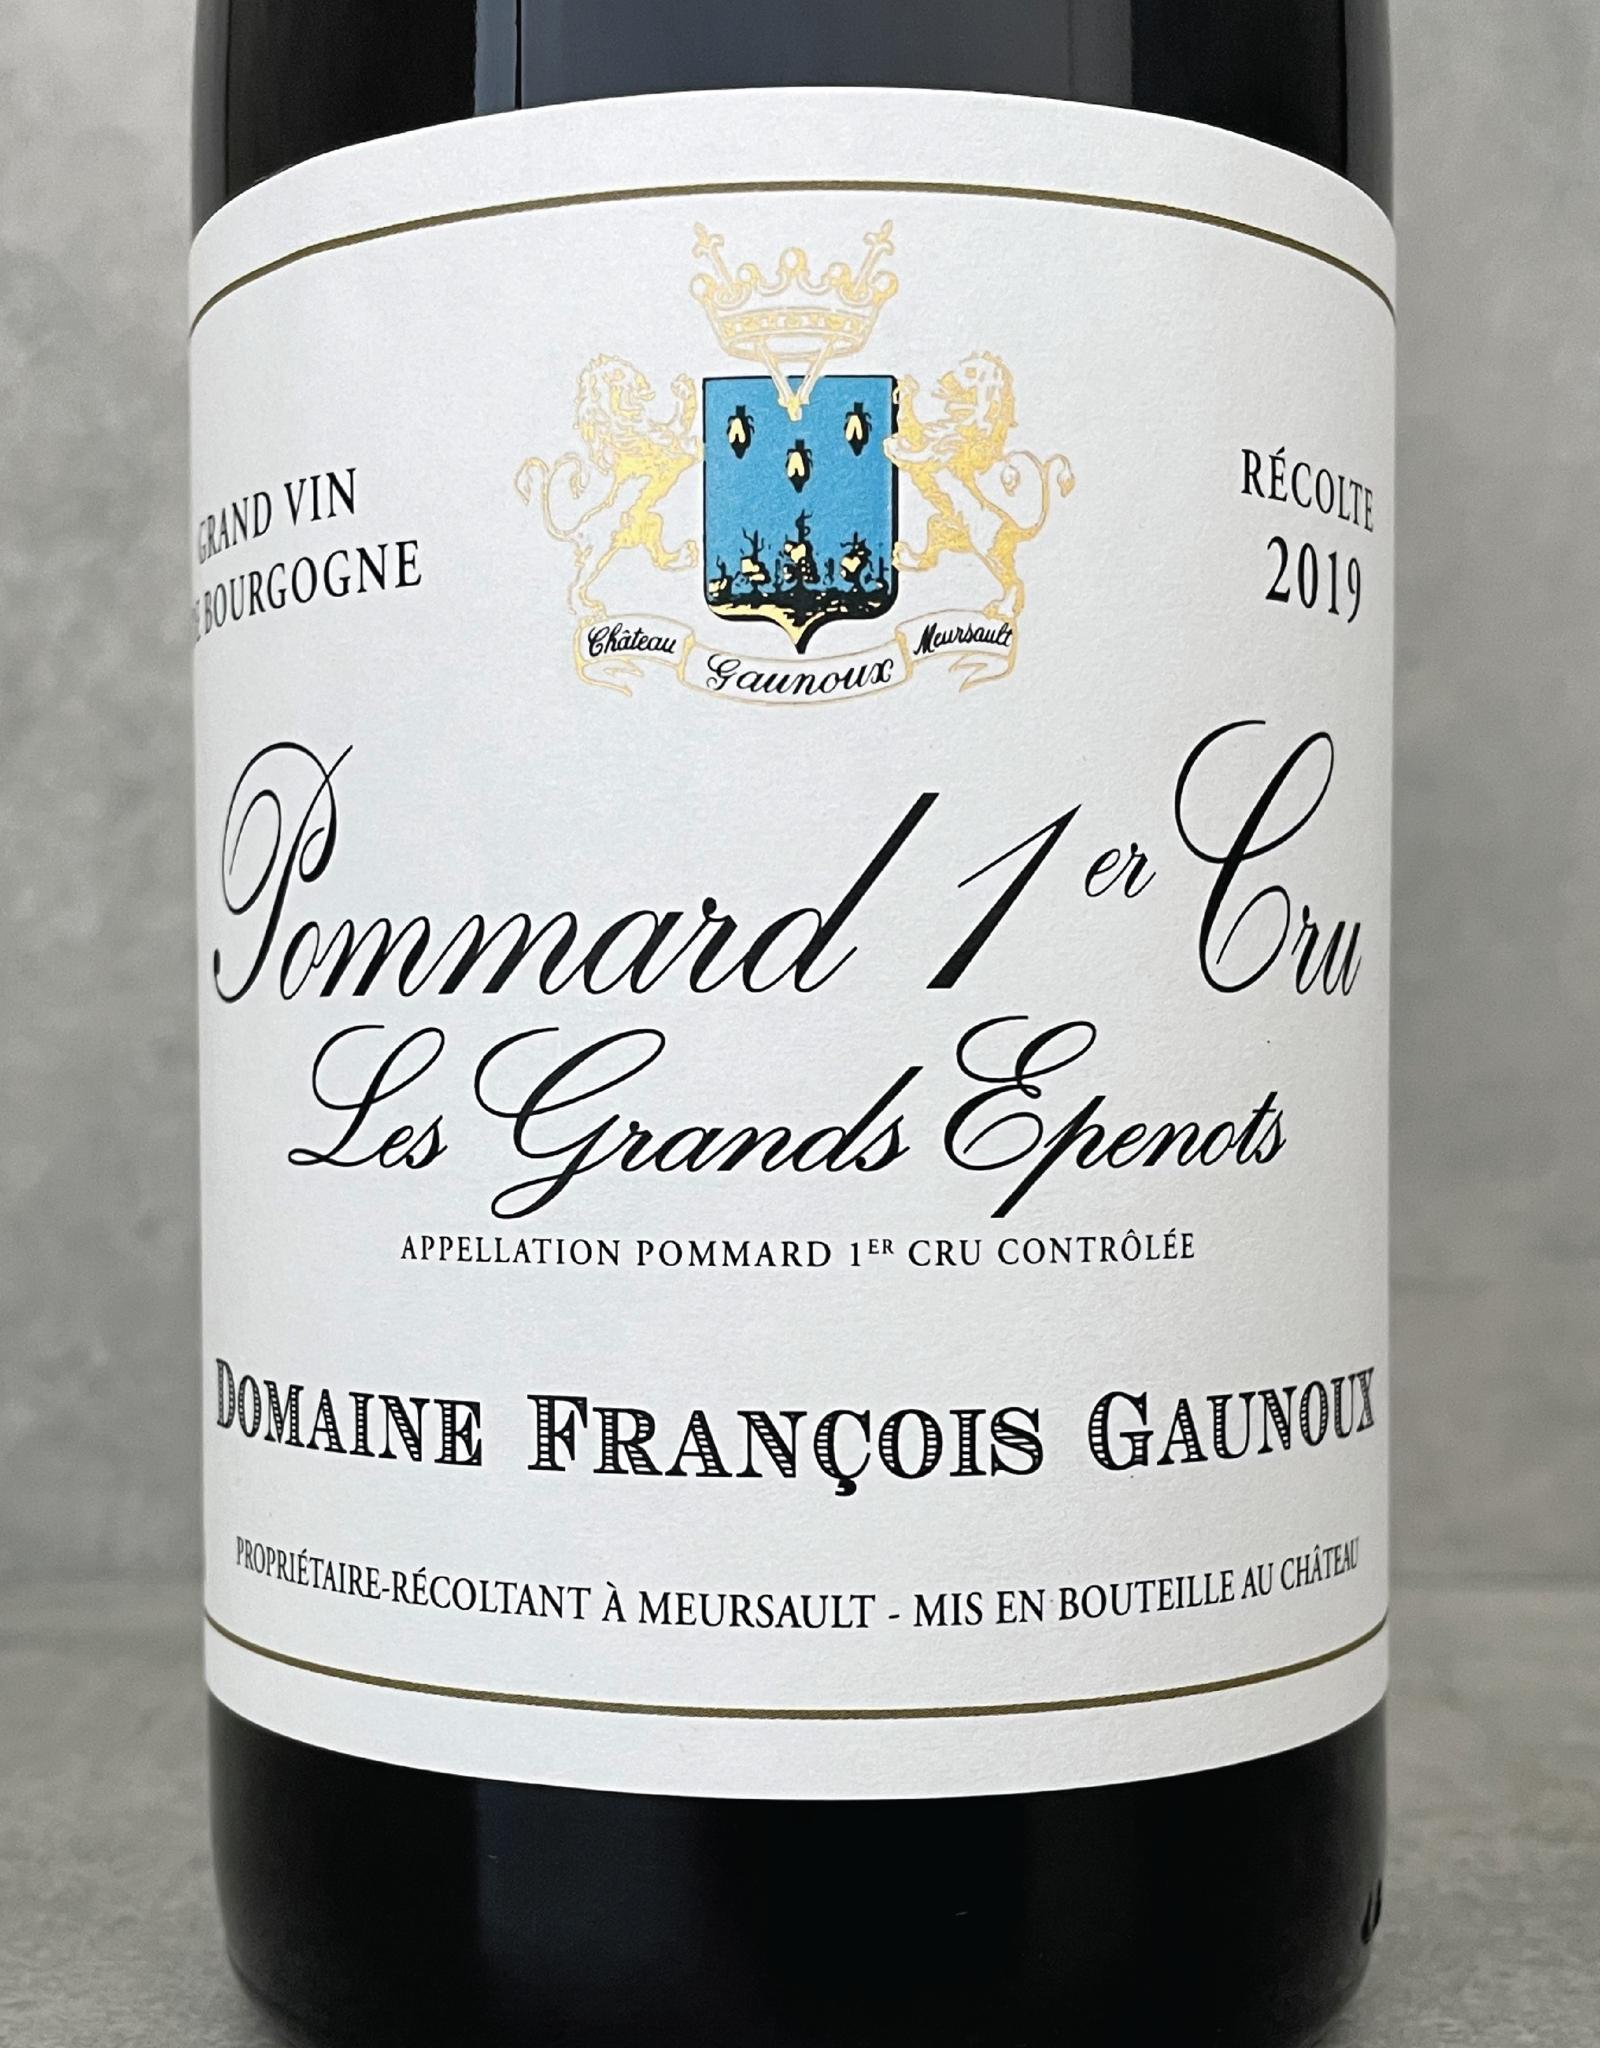 François Gaunoux Pommard 1er Cru Grands Epenots 2015